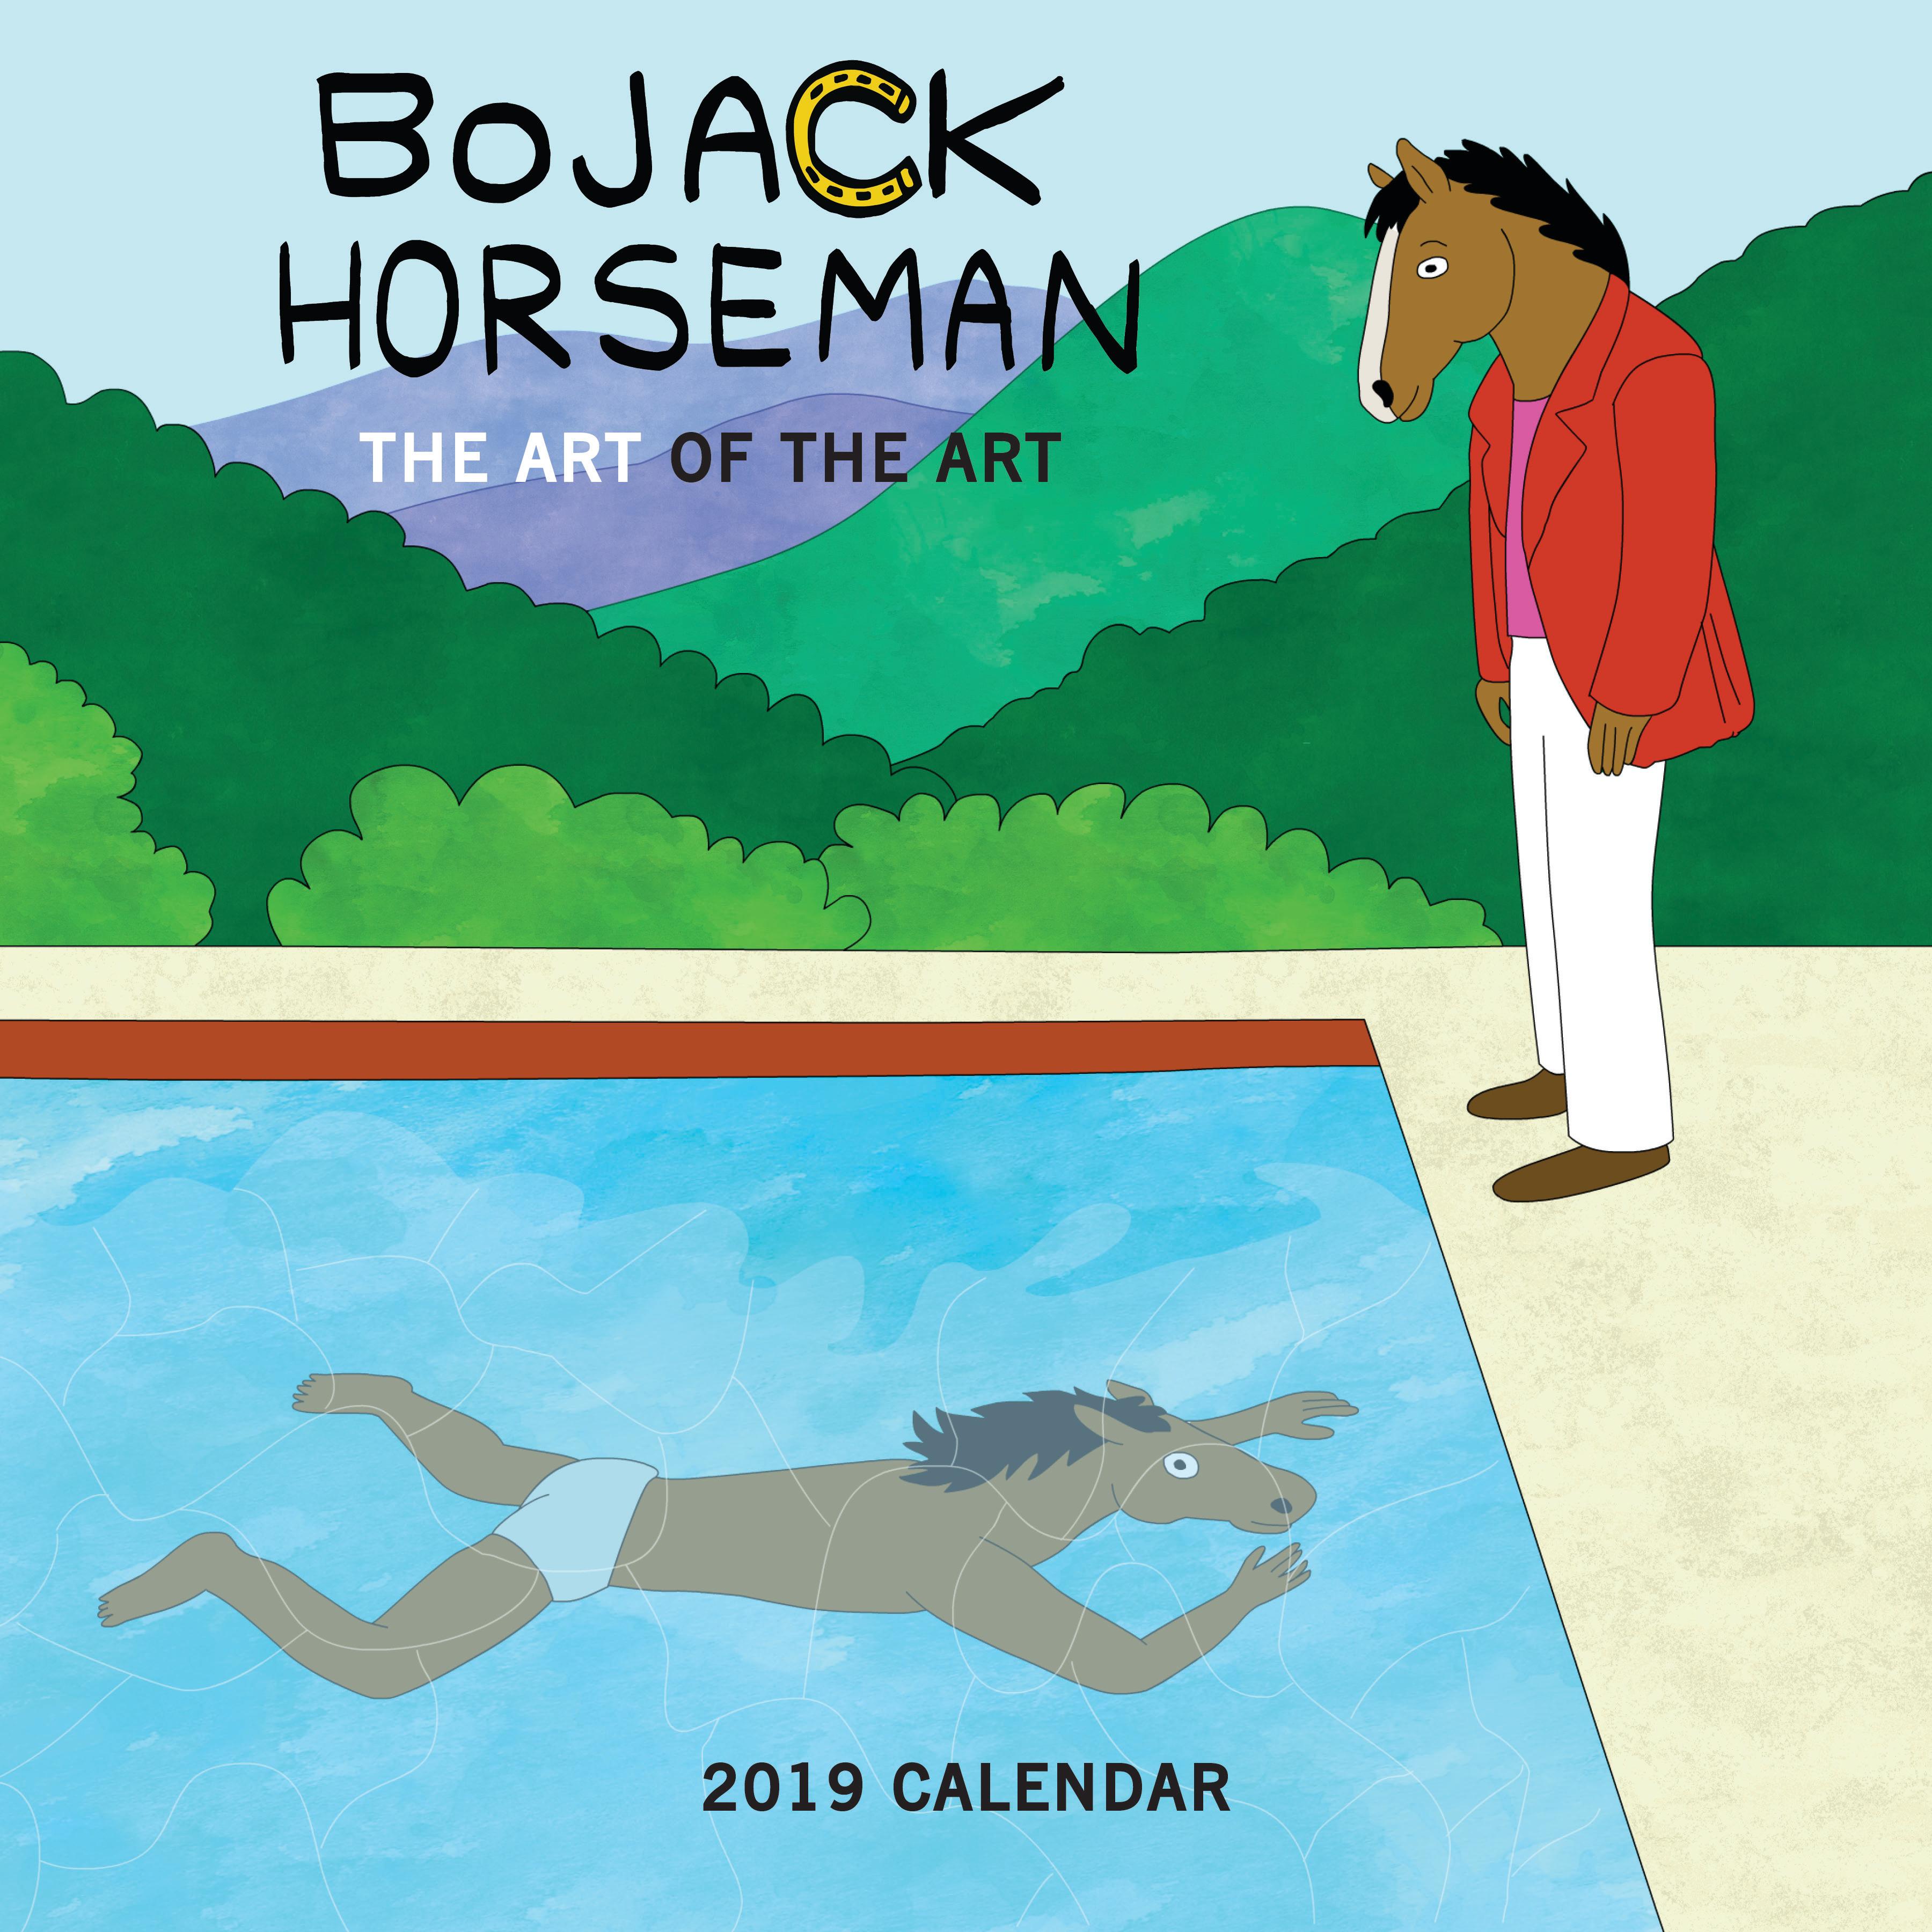 BoJack Horseman 2019